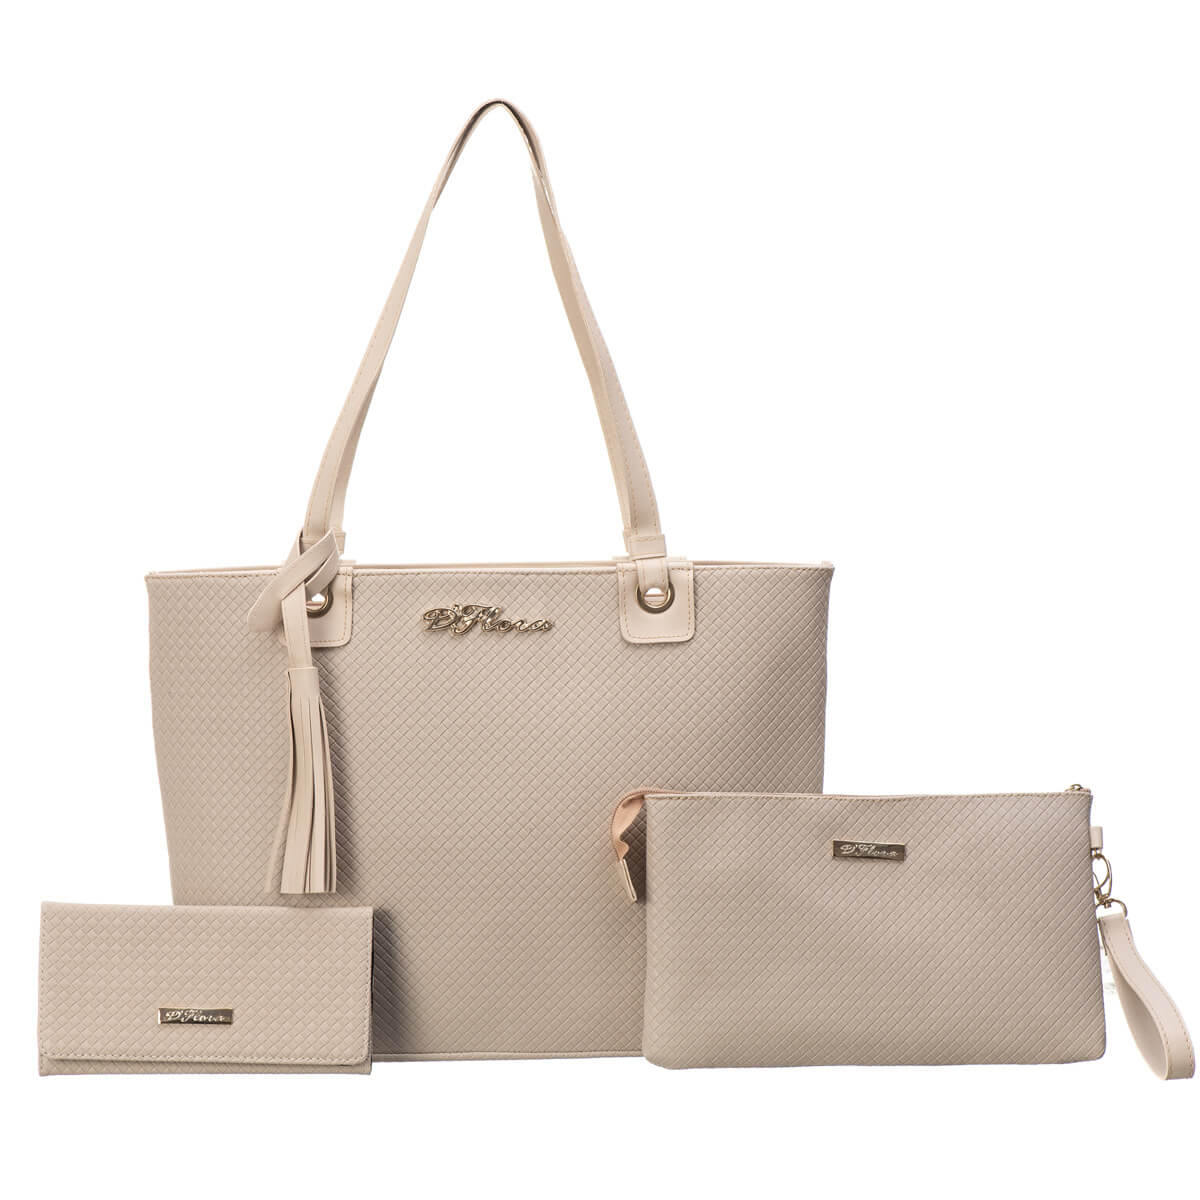 KIT Bolsa Grande + Carteira Feminina + Necessaire marca D'Flora